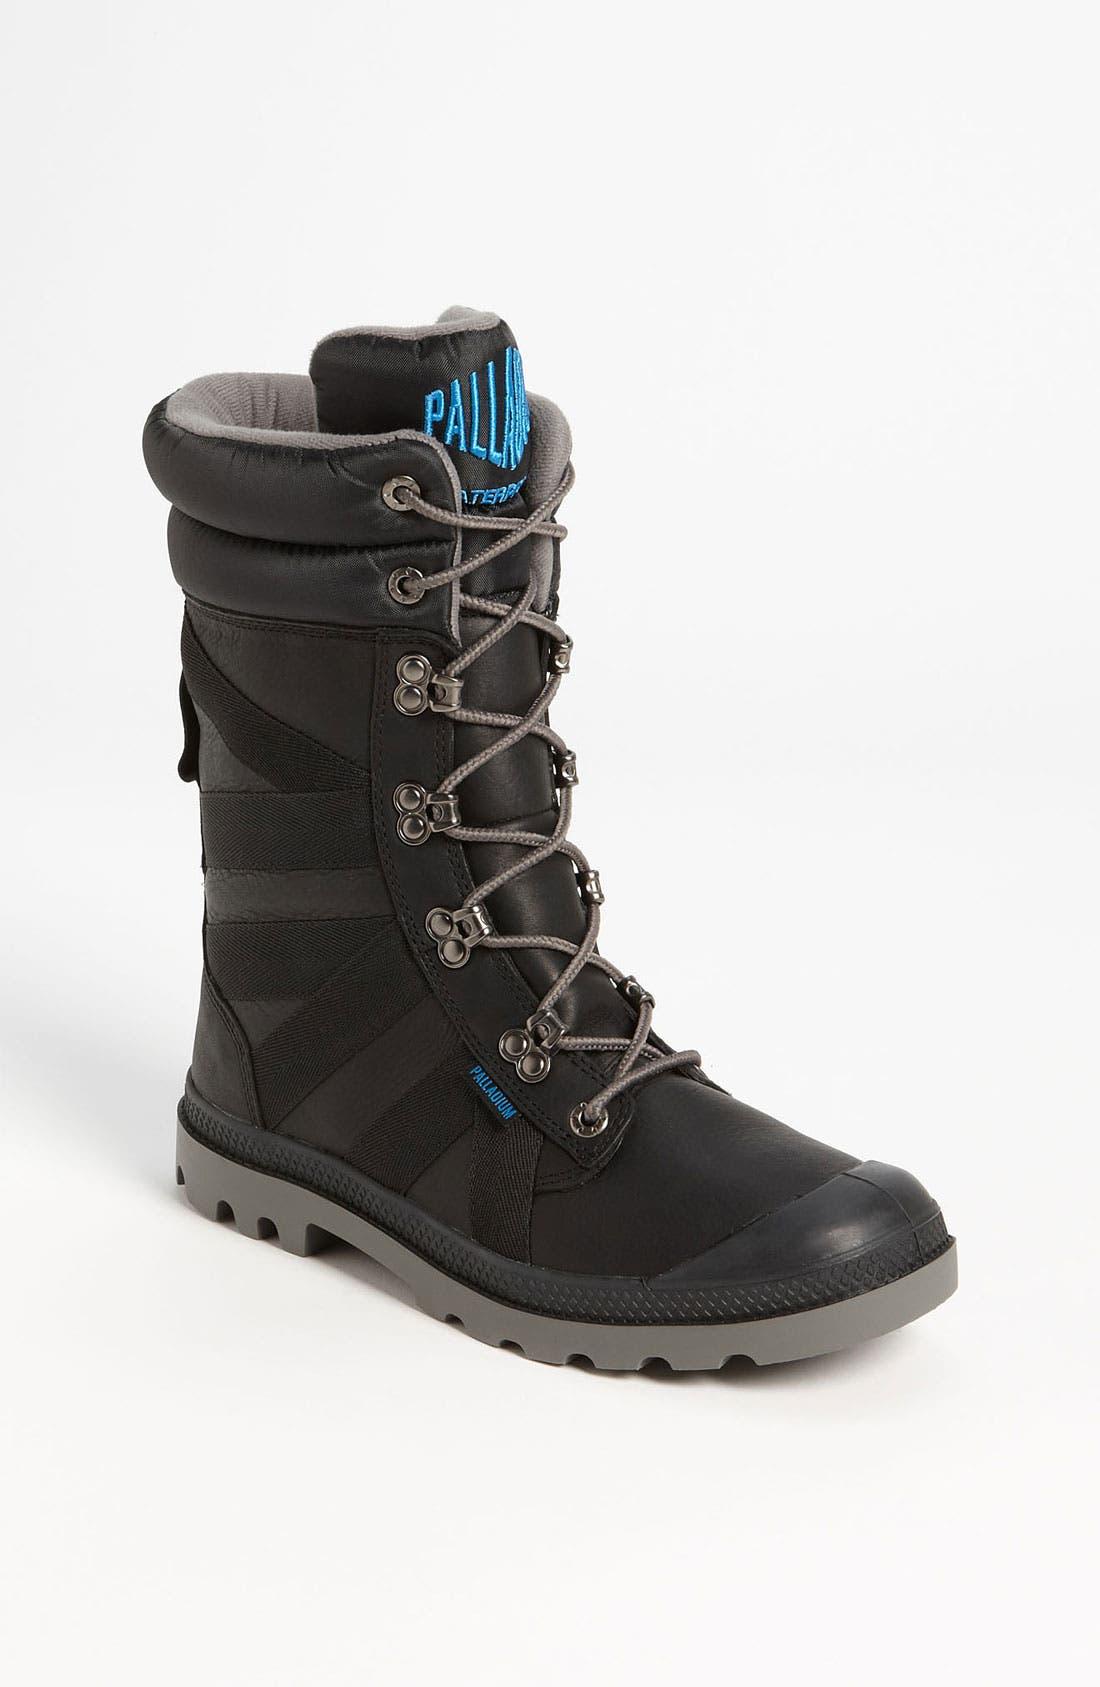 Main Image - Palladium 'Pampa' Snow Boot